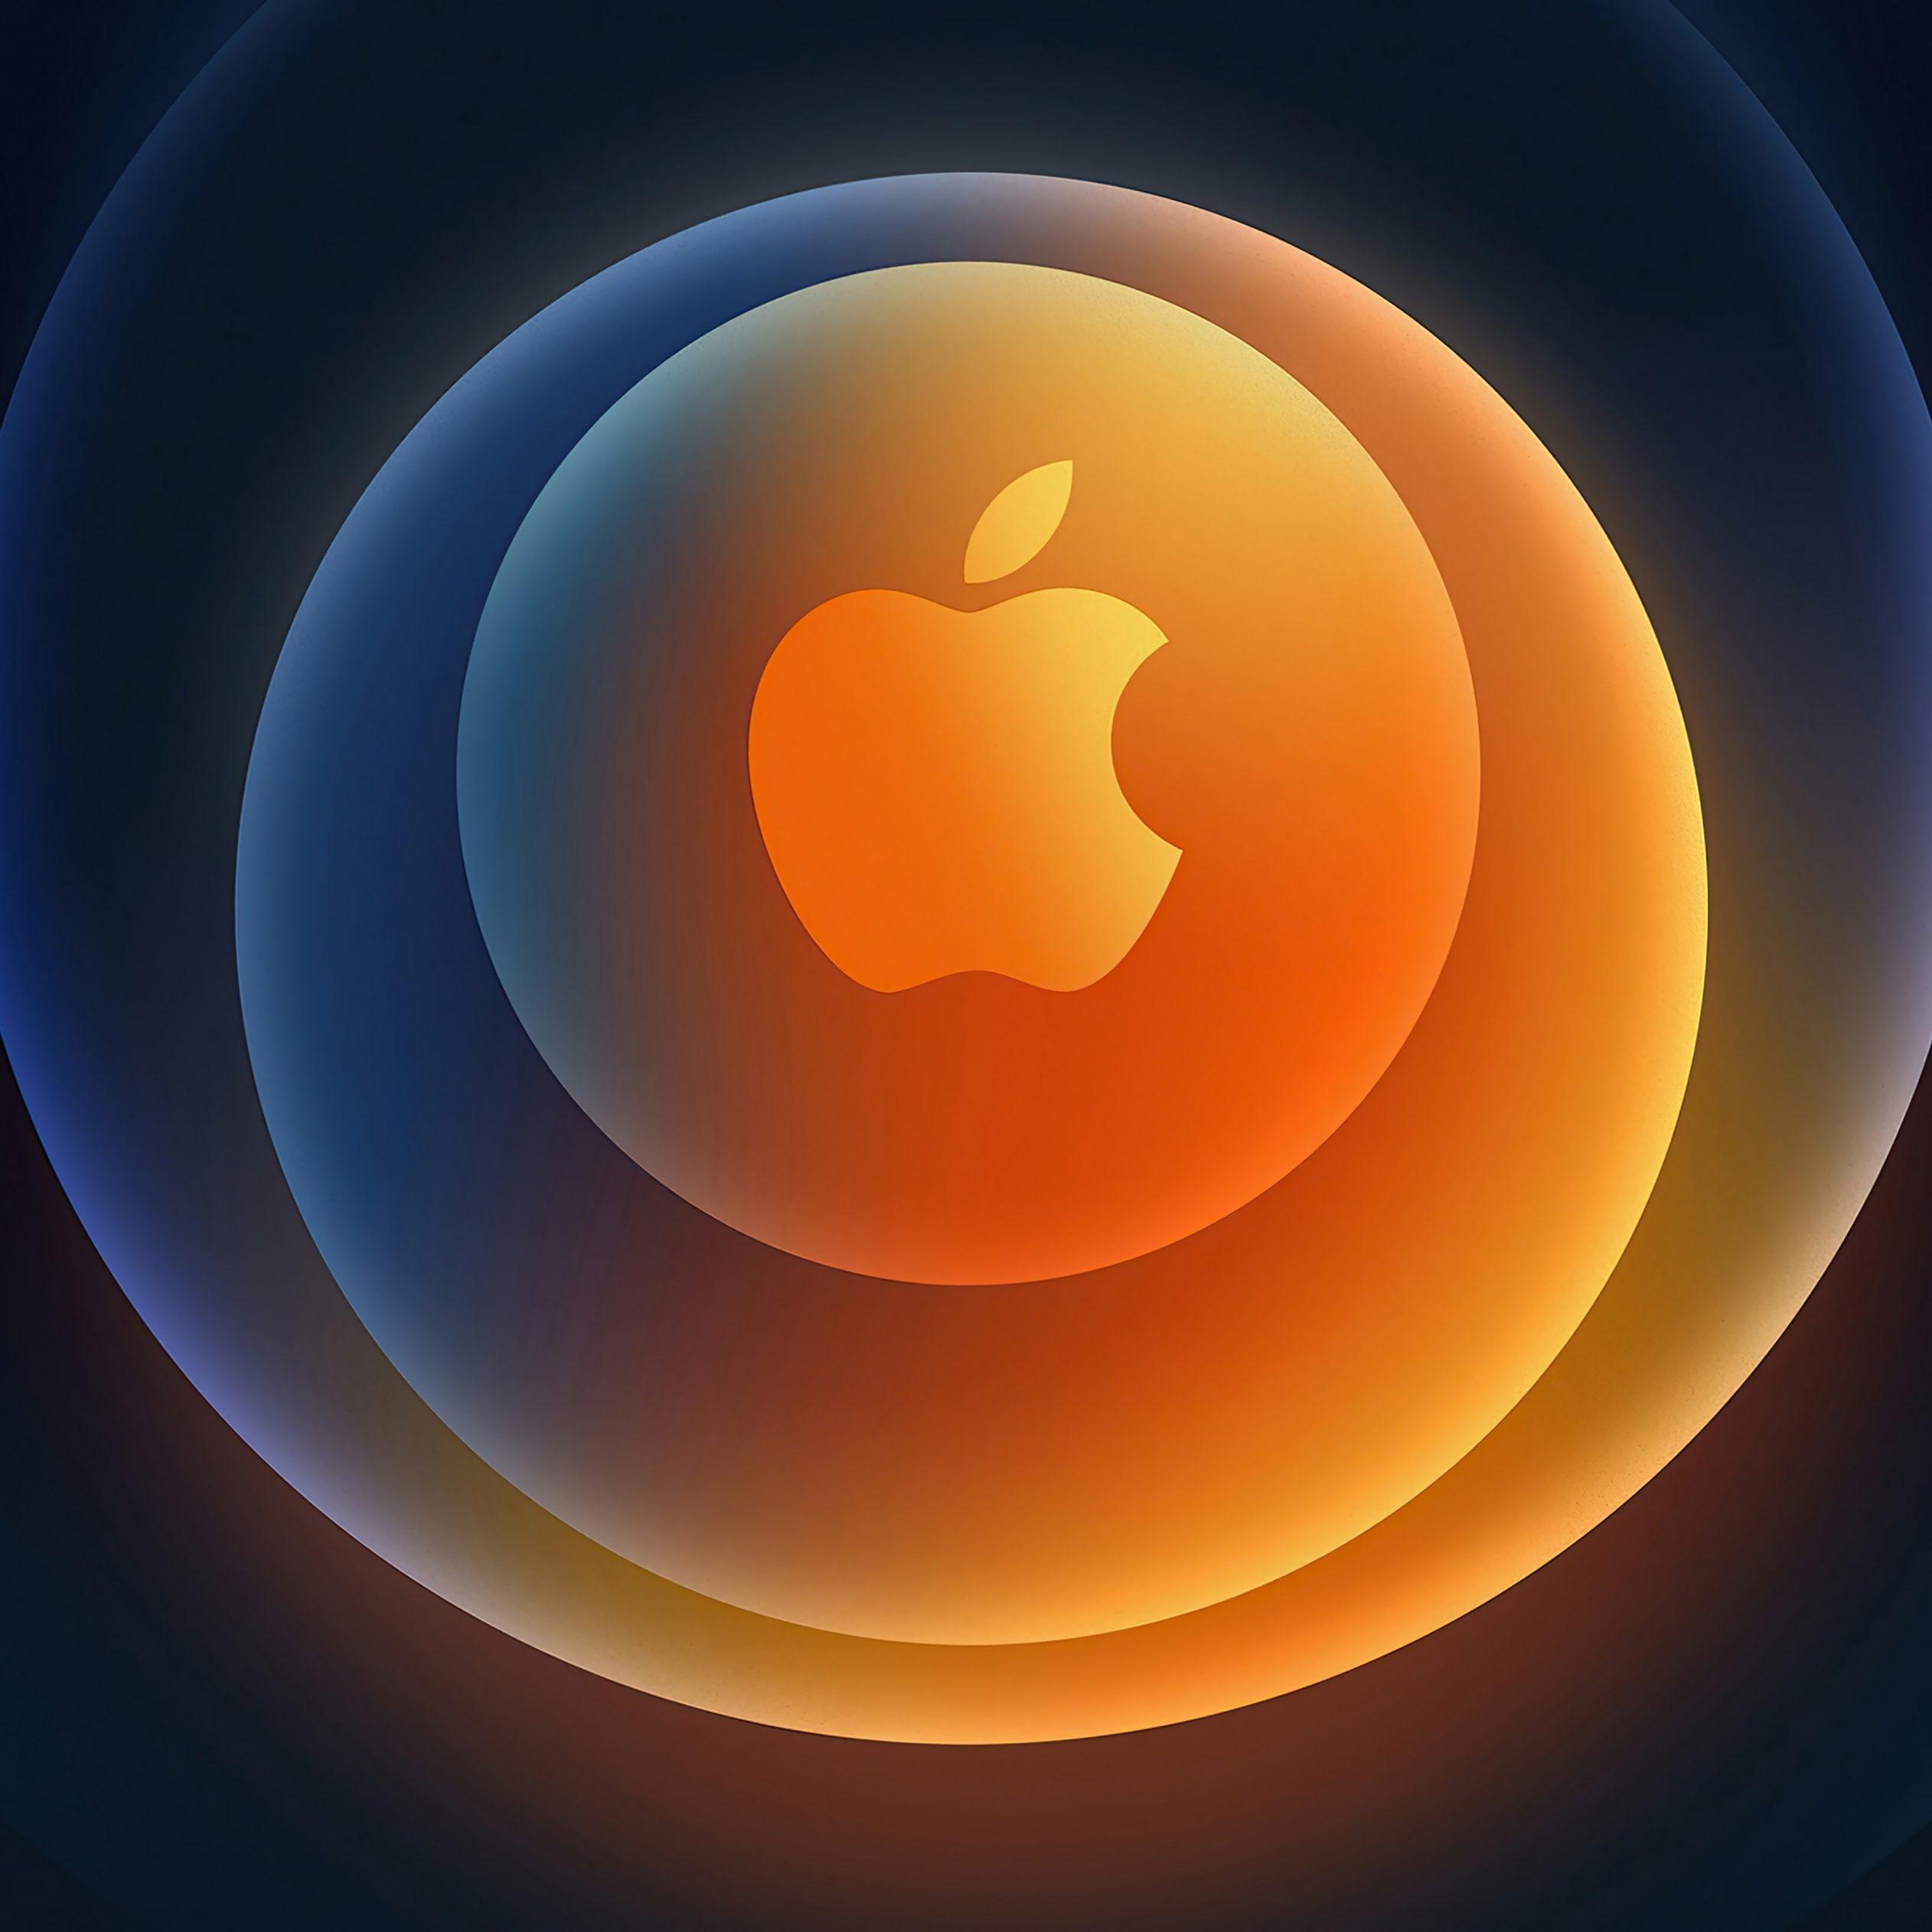 2524x2524 Parallax wallpaper 4k iPhone 12 Apple Logo Circles iPad Wallpaper 2524x2524 pixels resolution